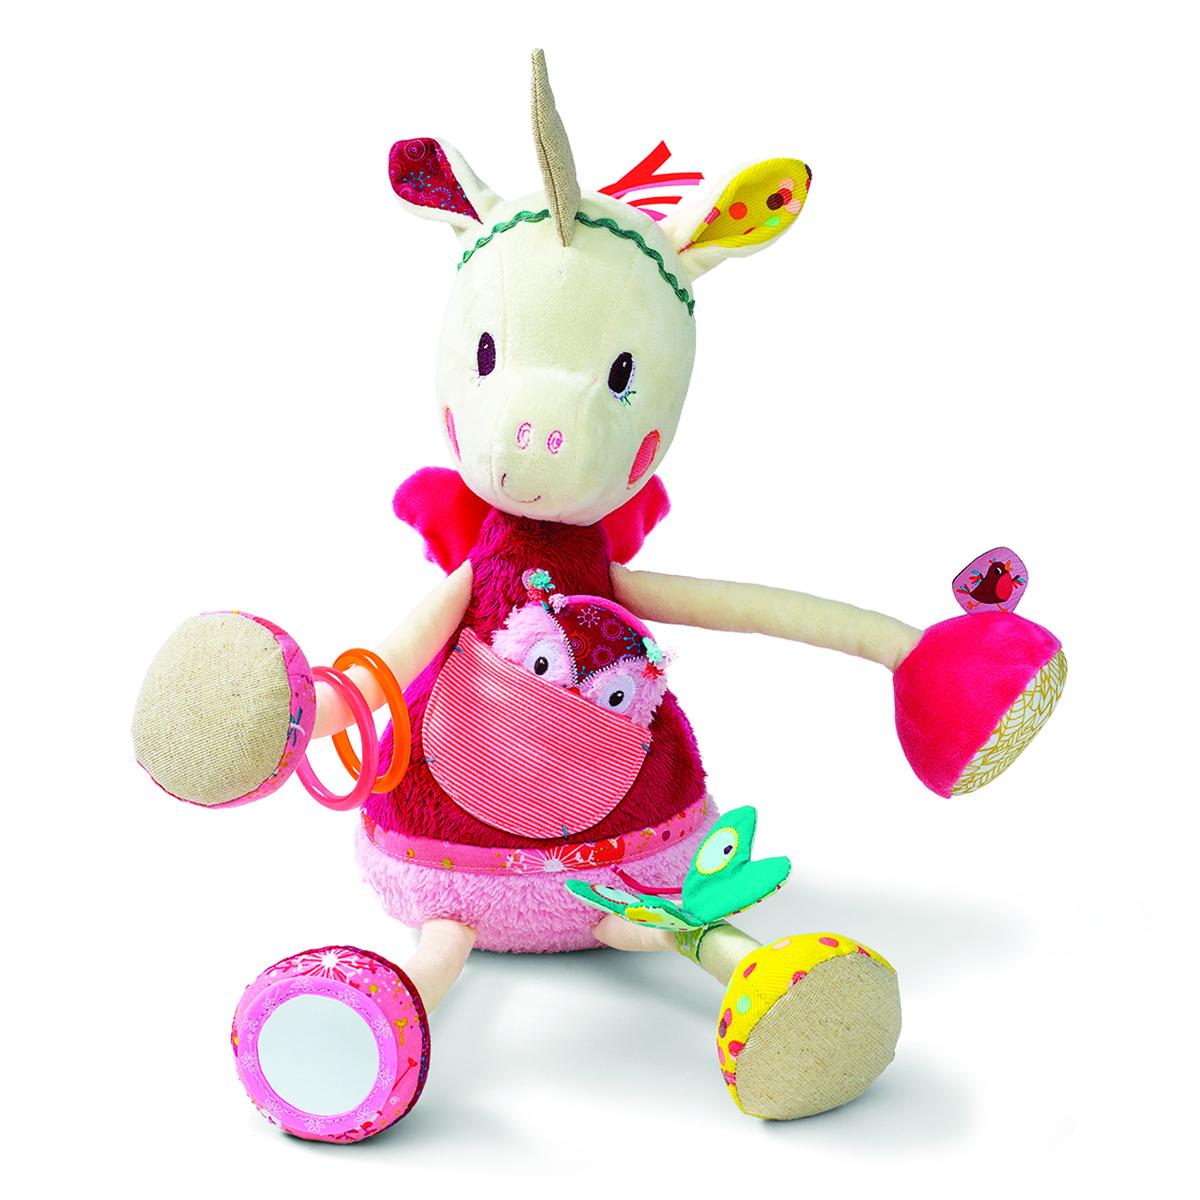 Lilliputiens Развивающая игрушка Единорожка Луиза погремушки lilliputiens ручная единорожка луиза